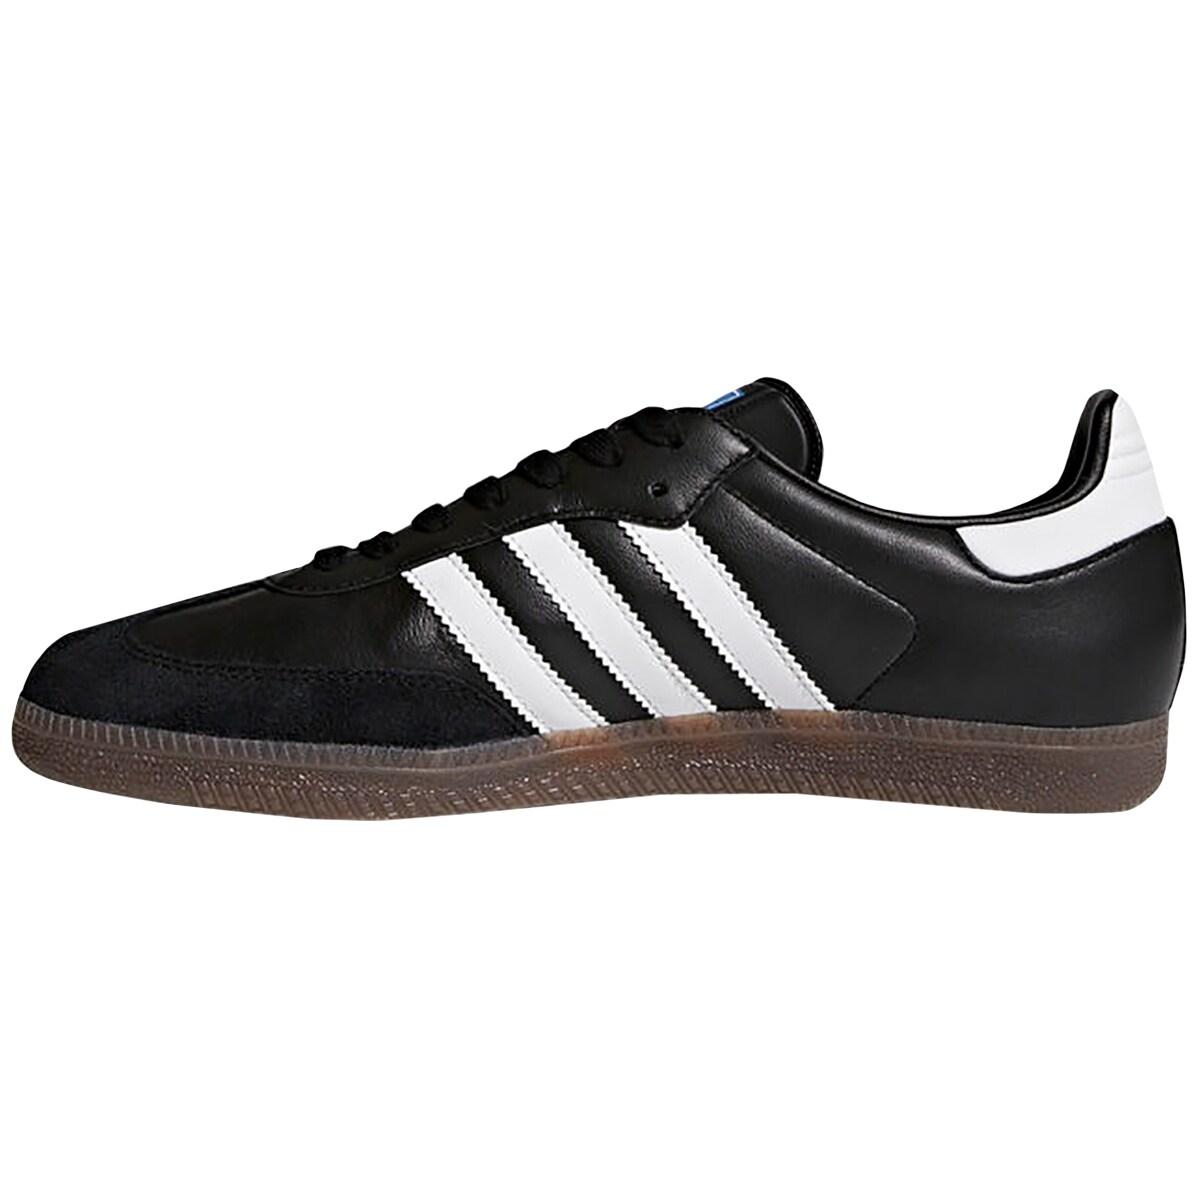 new concept 8ade9 8c3e5 Shop Adidas Originals Samba OG OrthoLite Leather Casual Shoes - Black White Gum  - Free Shipping Today - Overstock - 19813121